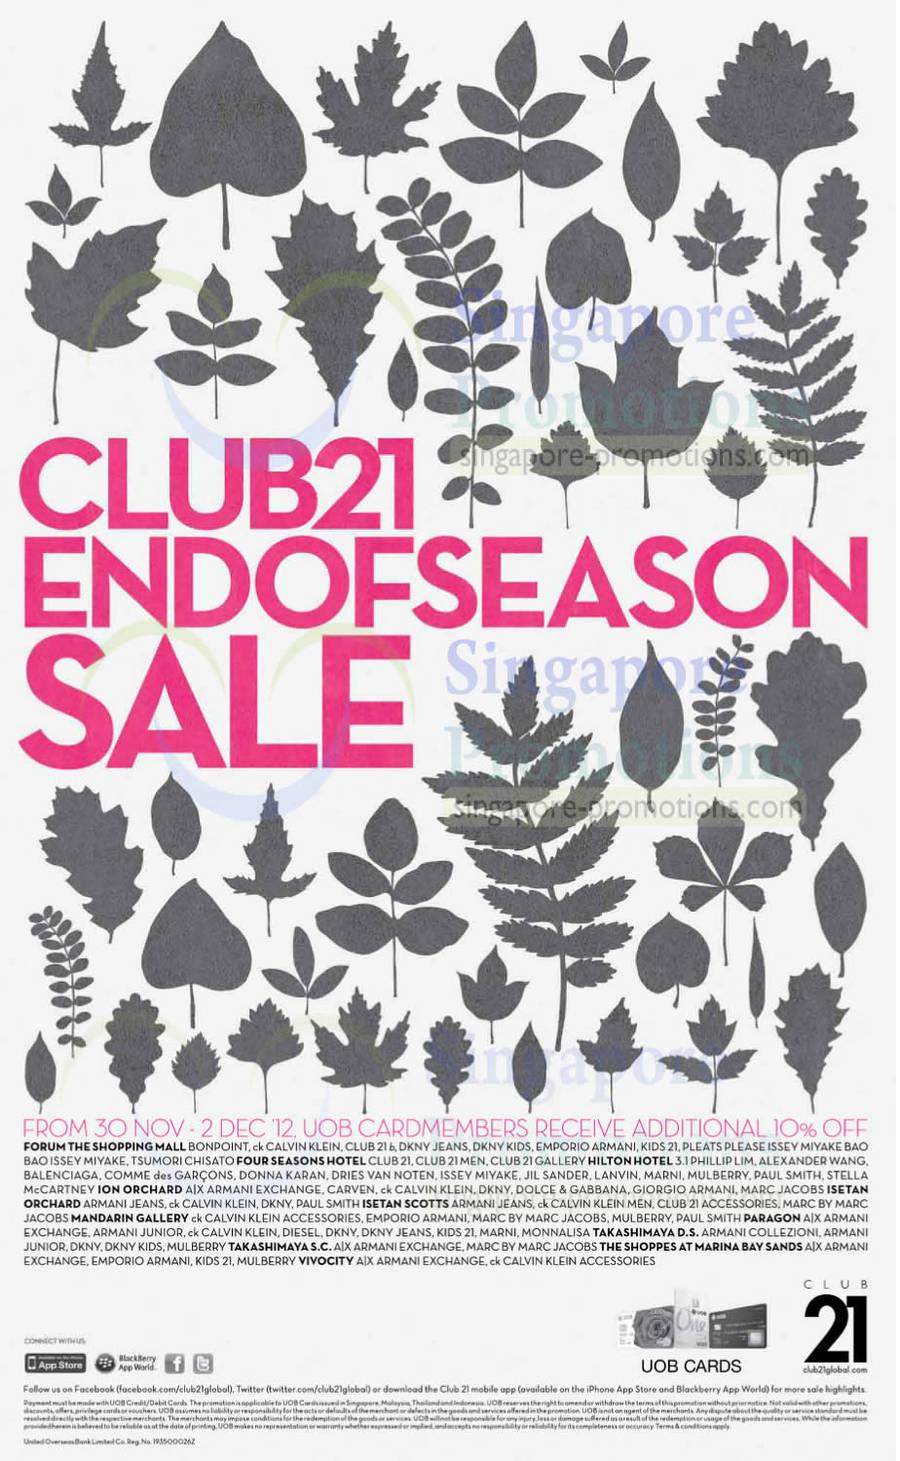 Club 21 End of Season Sale